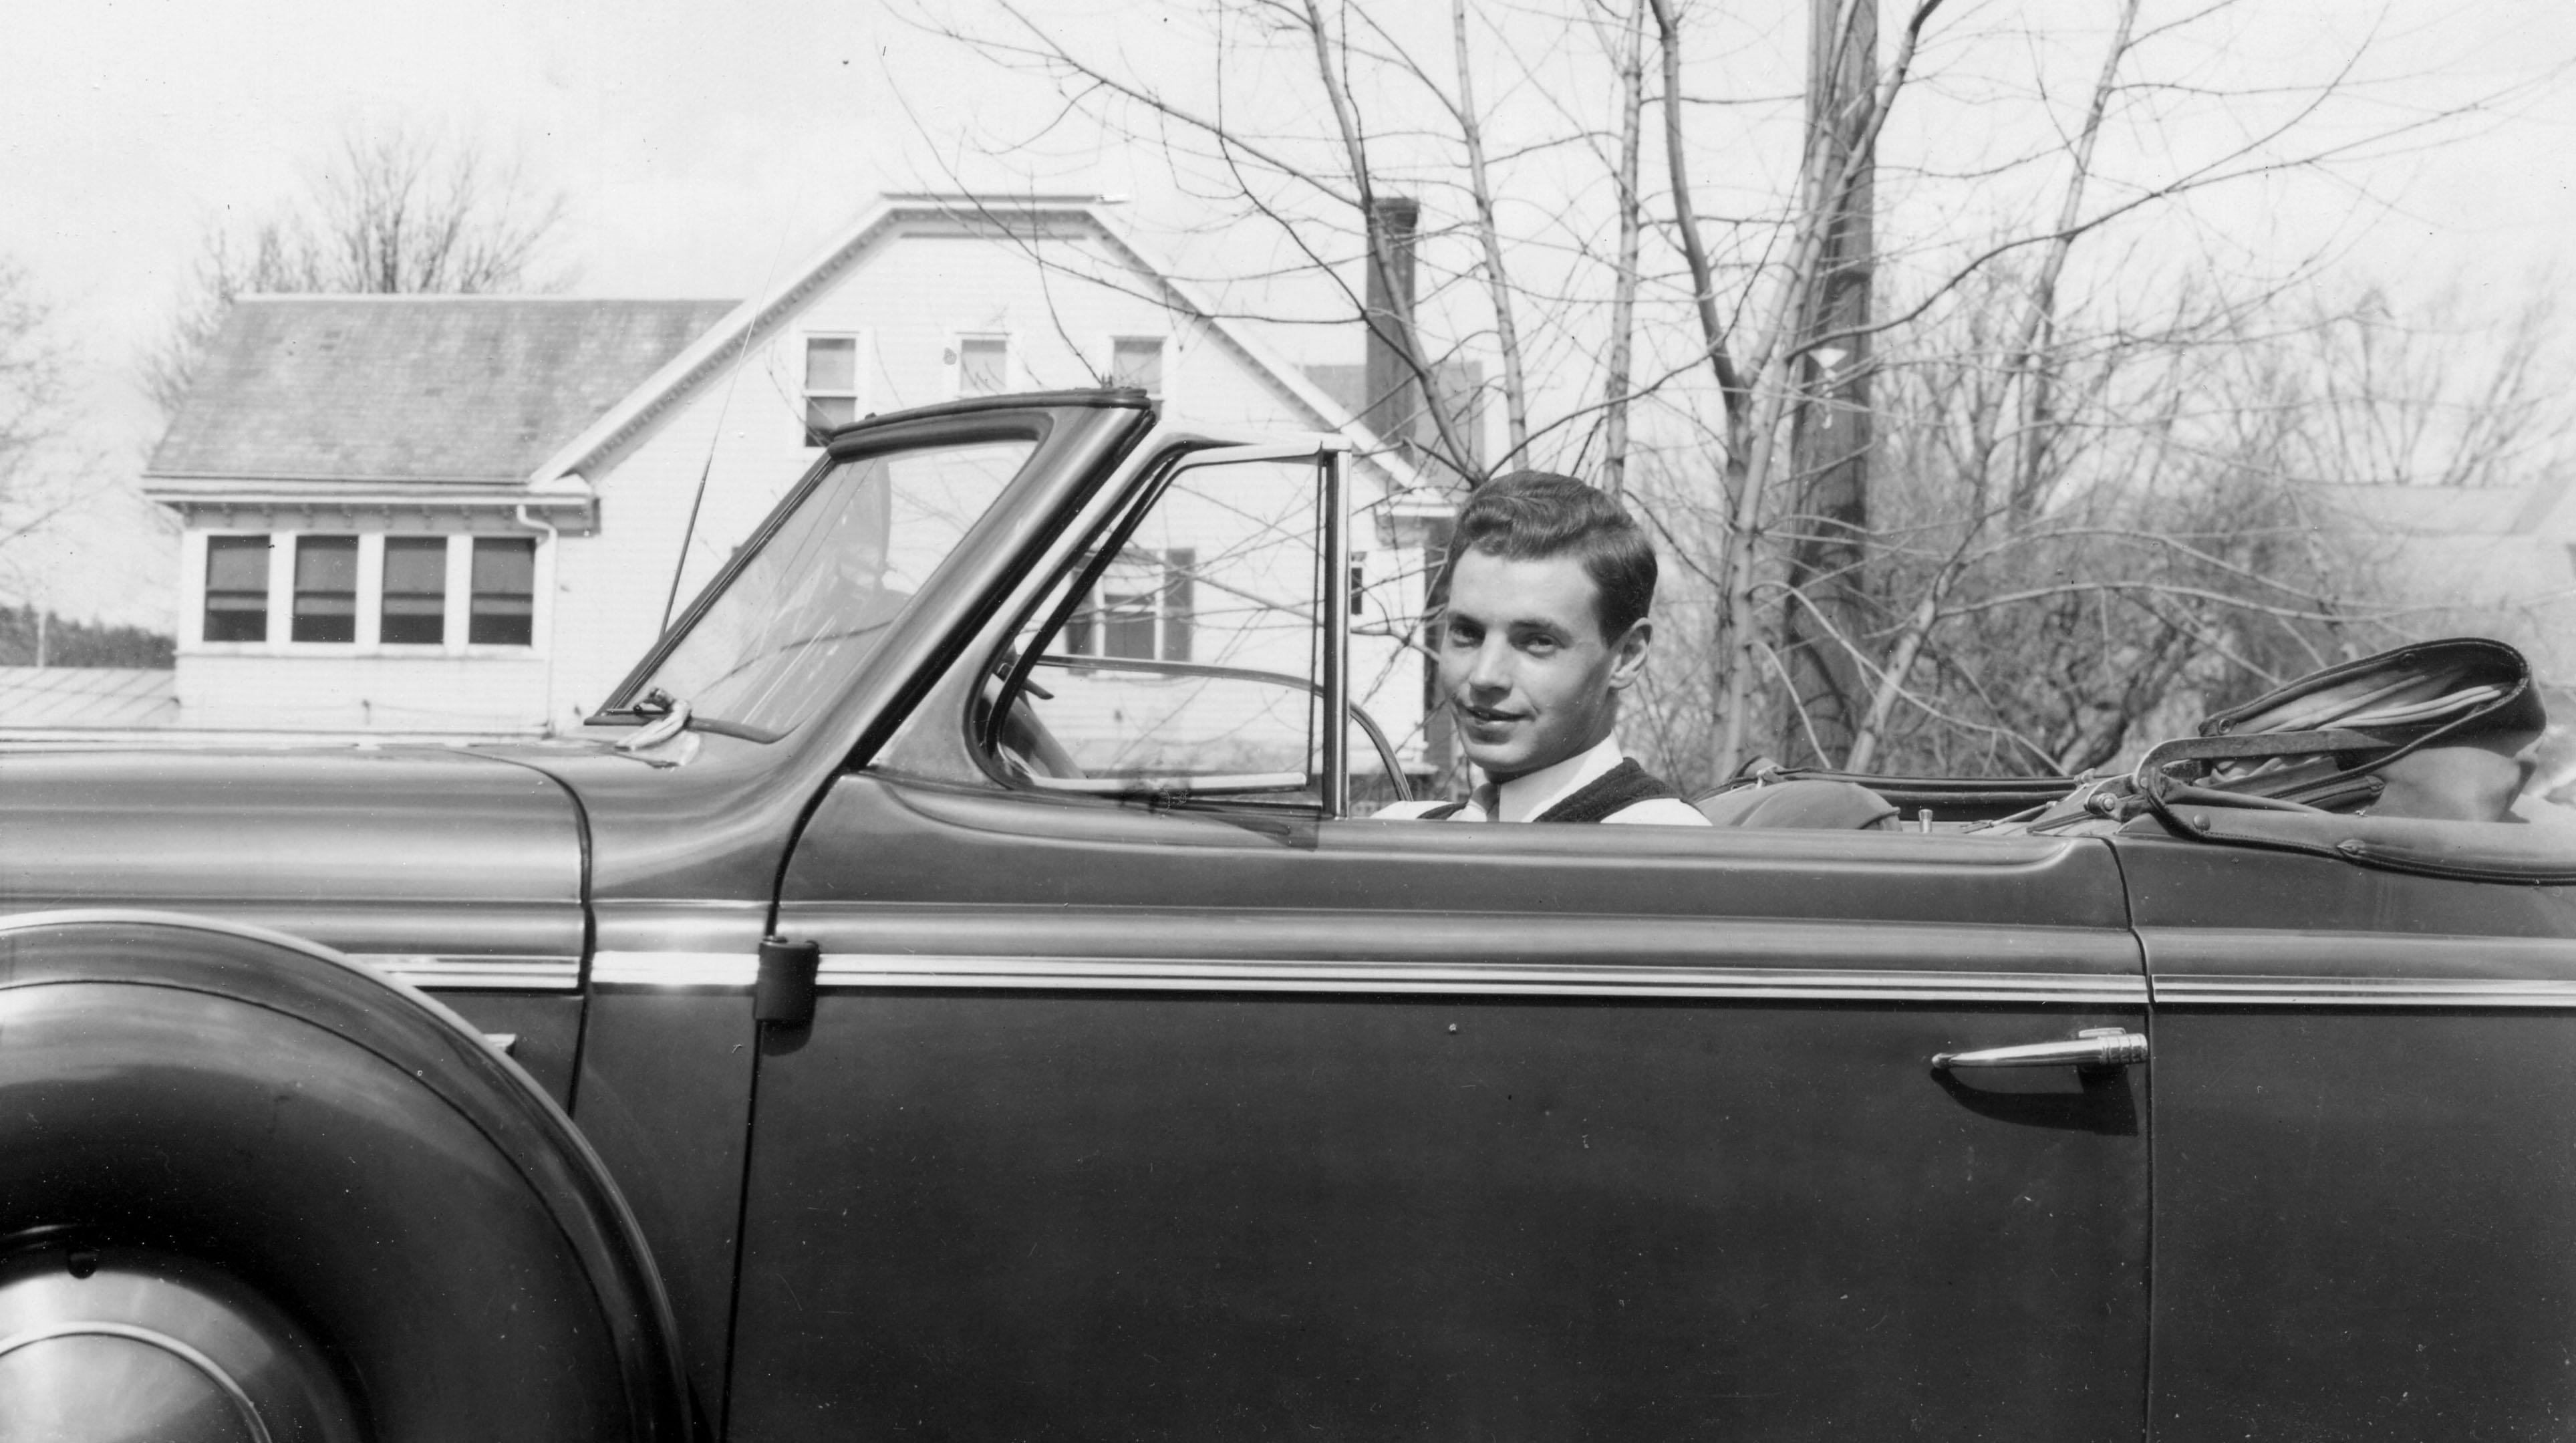 Bill's favorite car, a 38 Buick